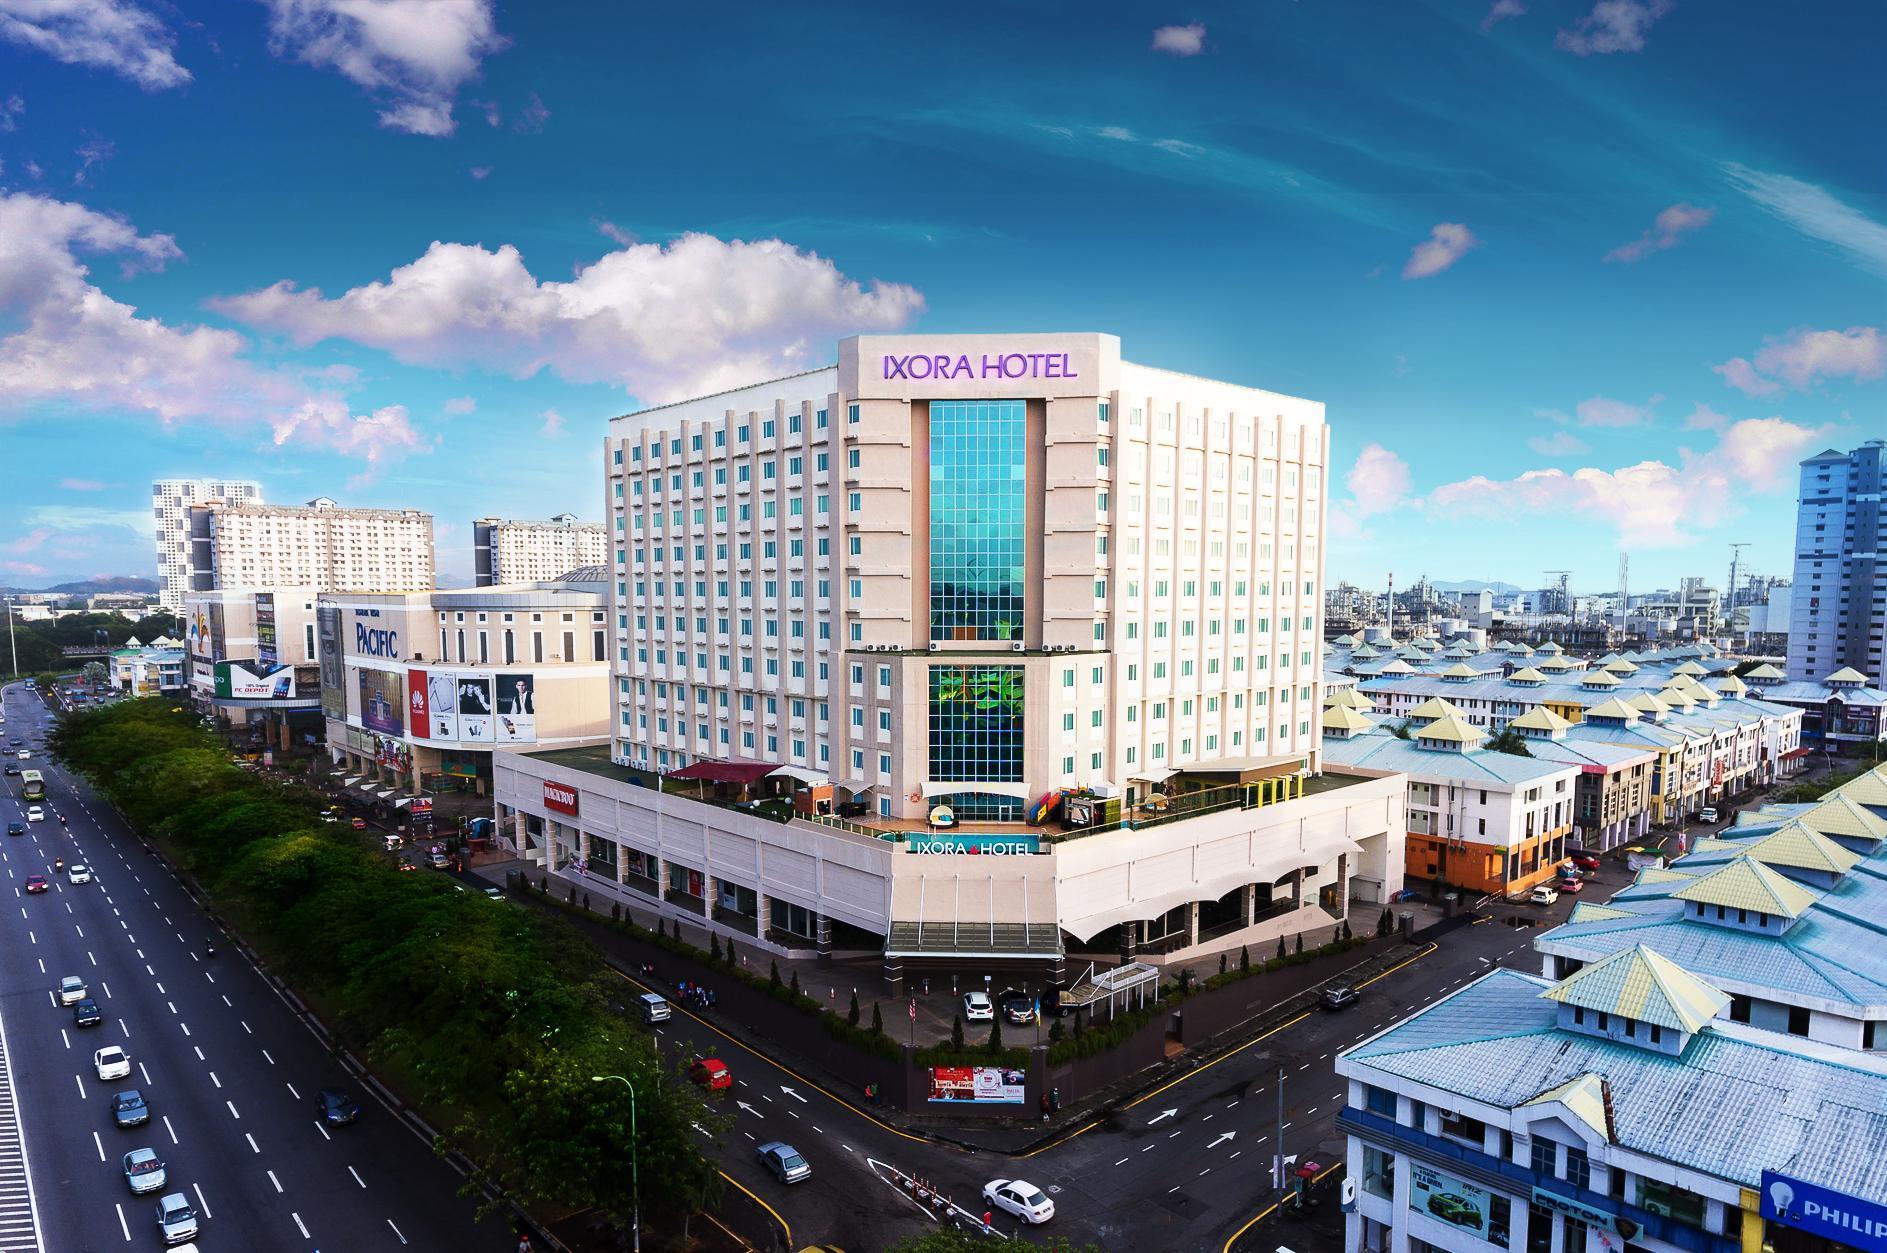 Ixora hotel penang penang malaysia hotels hotel - Seberang jaya public swimming pool ...